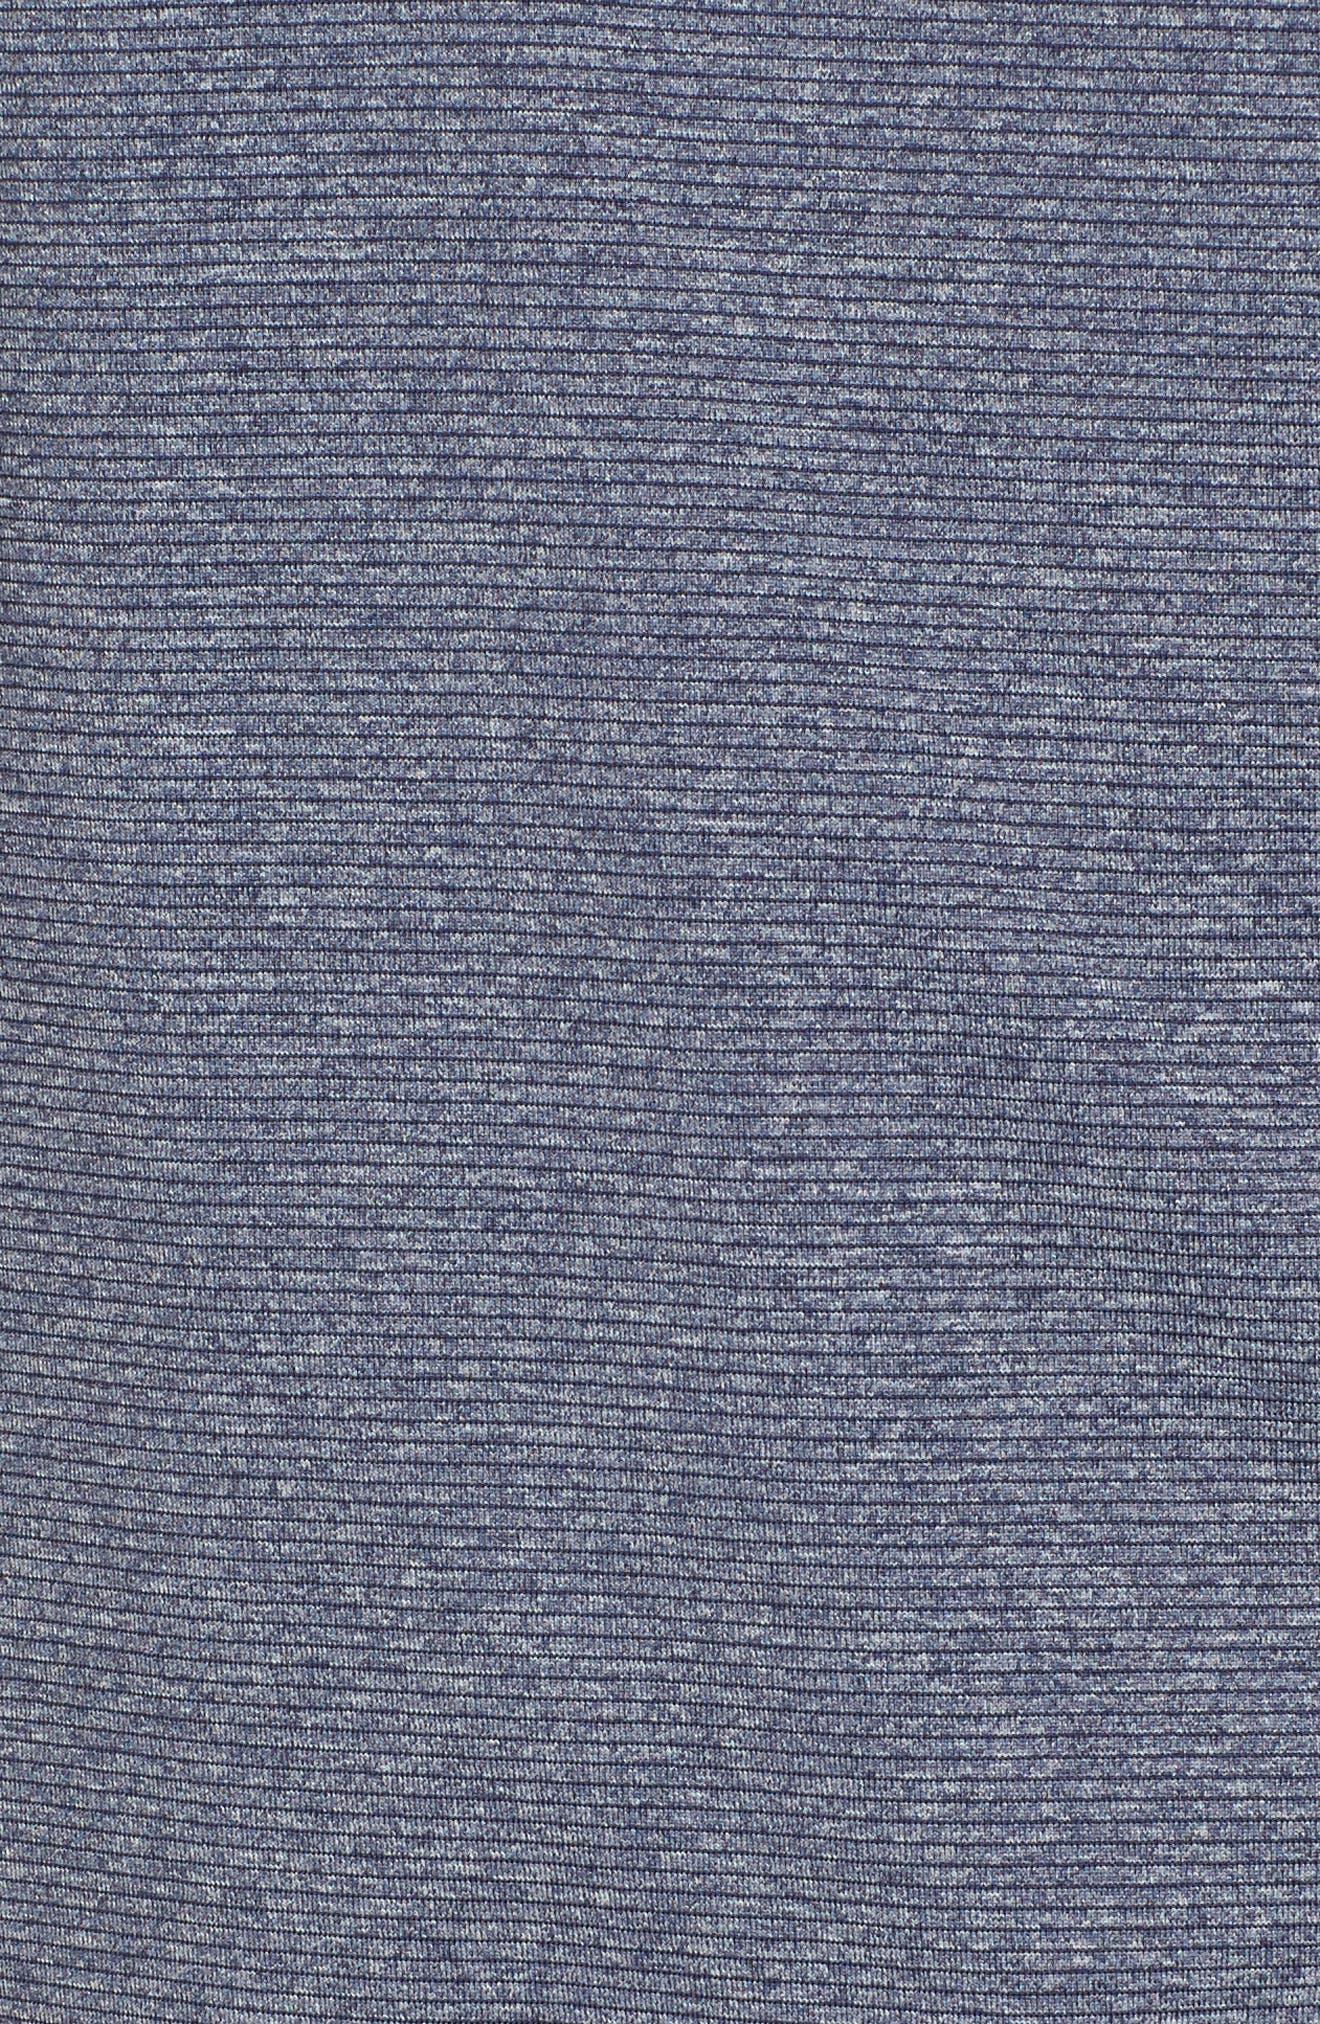 Shoreline - Seattle Seahawks Half Zip Pullover,                             Alternate thumbnail 5, color,                             Liberty Navy Heather